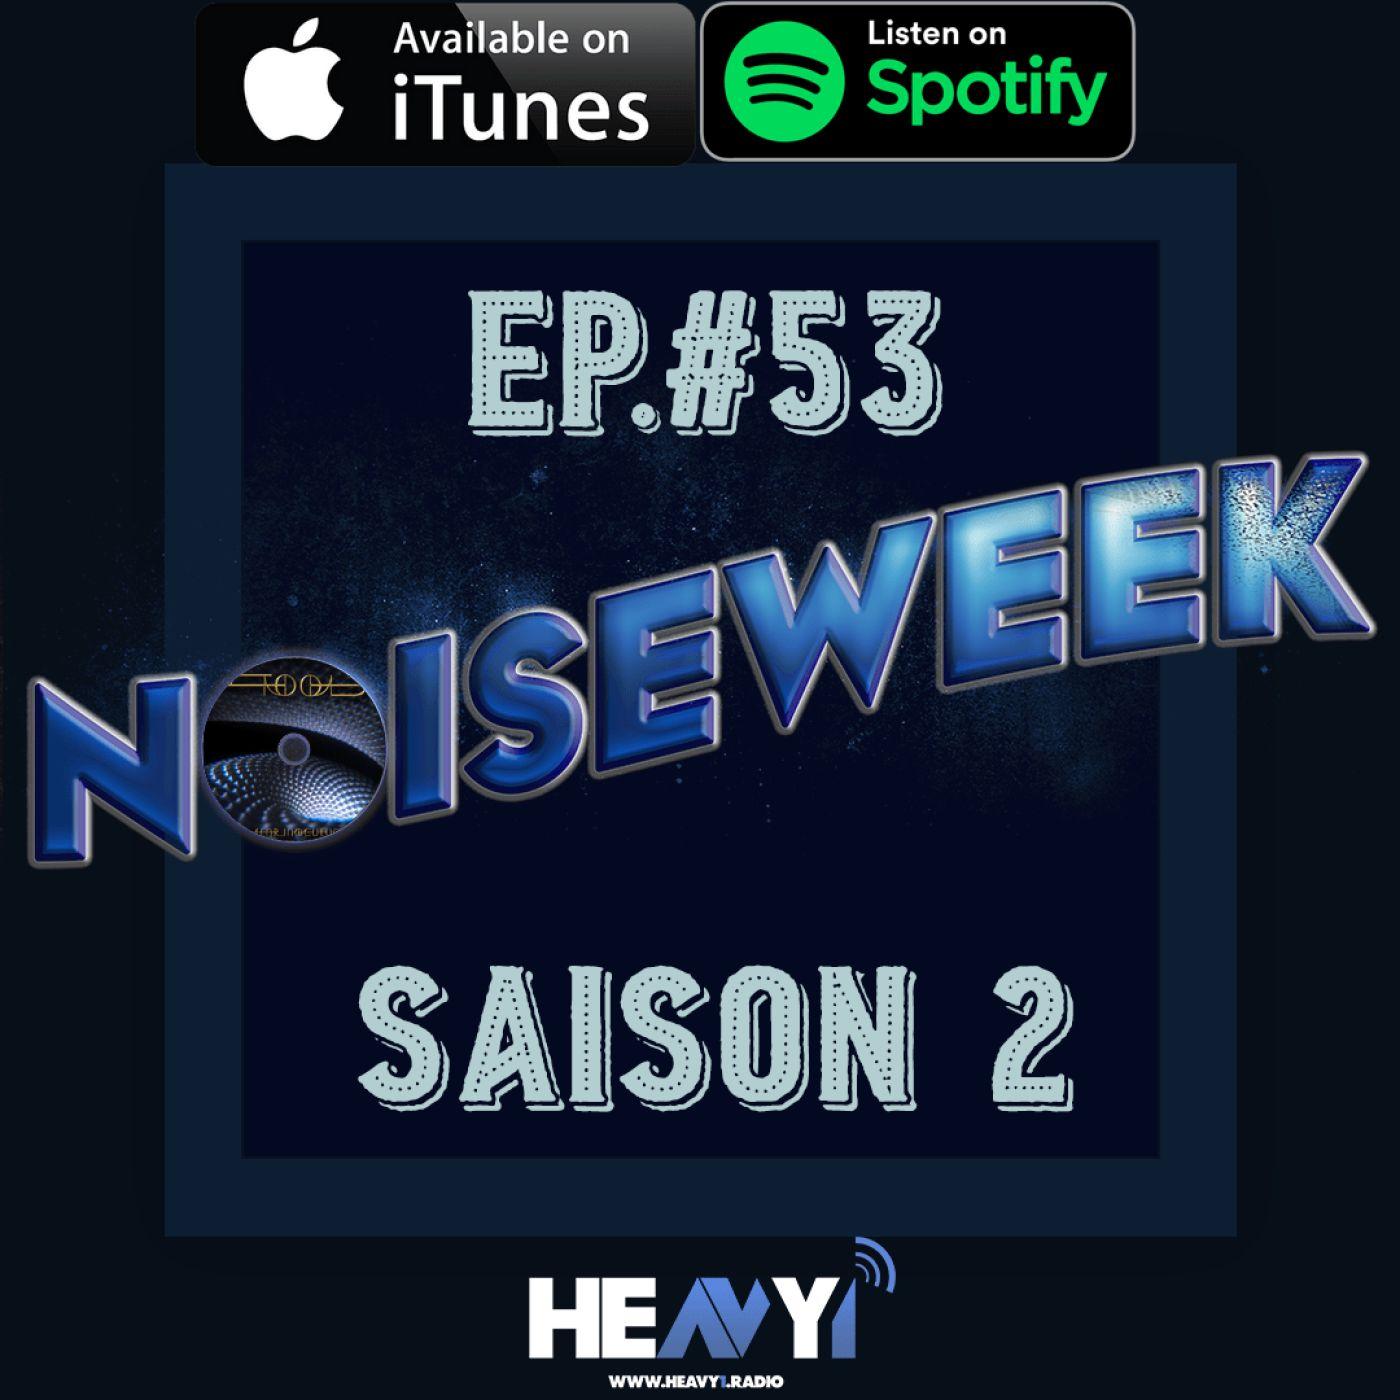 Noiseweek #53 Saison 2